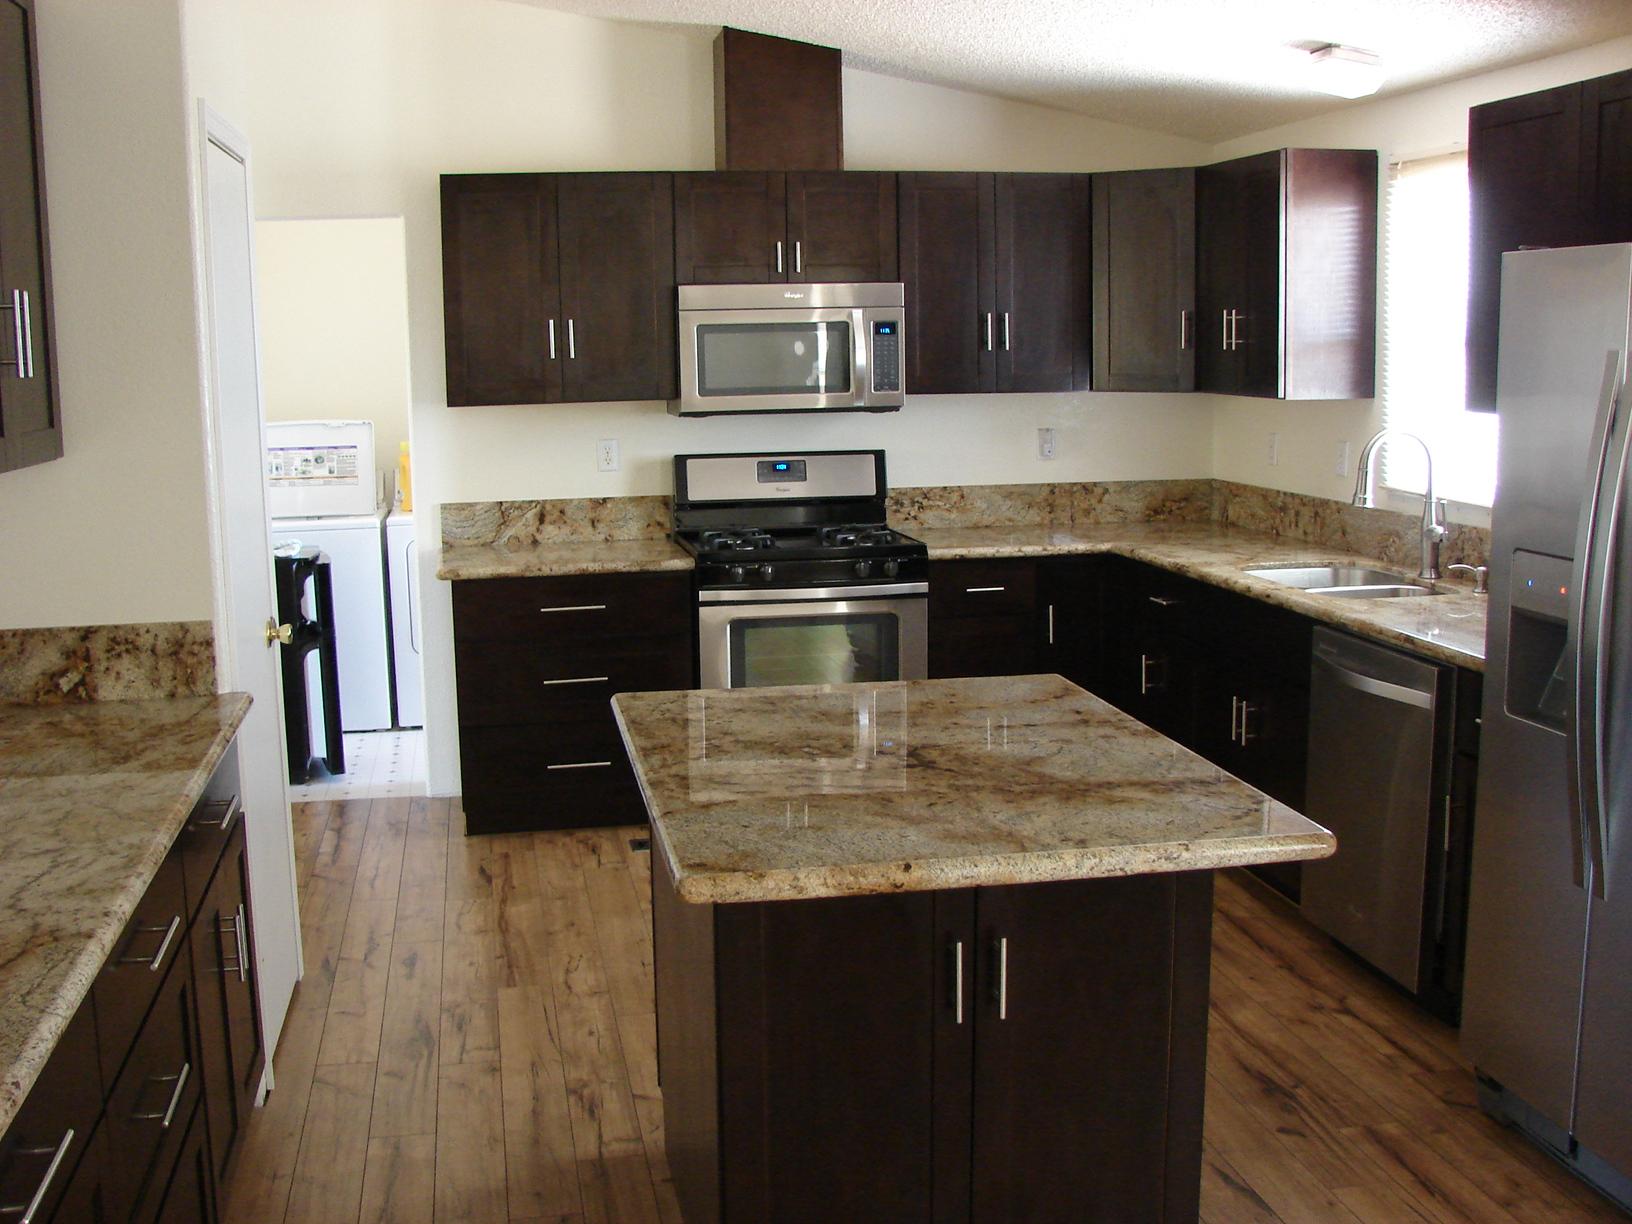 average cost granite counter tops cost of kitchen countertops average cost for granite counter tops